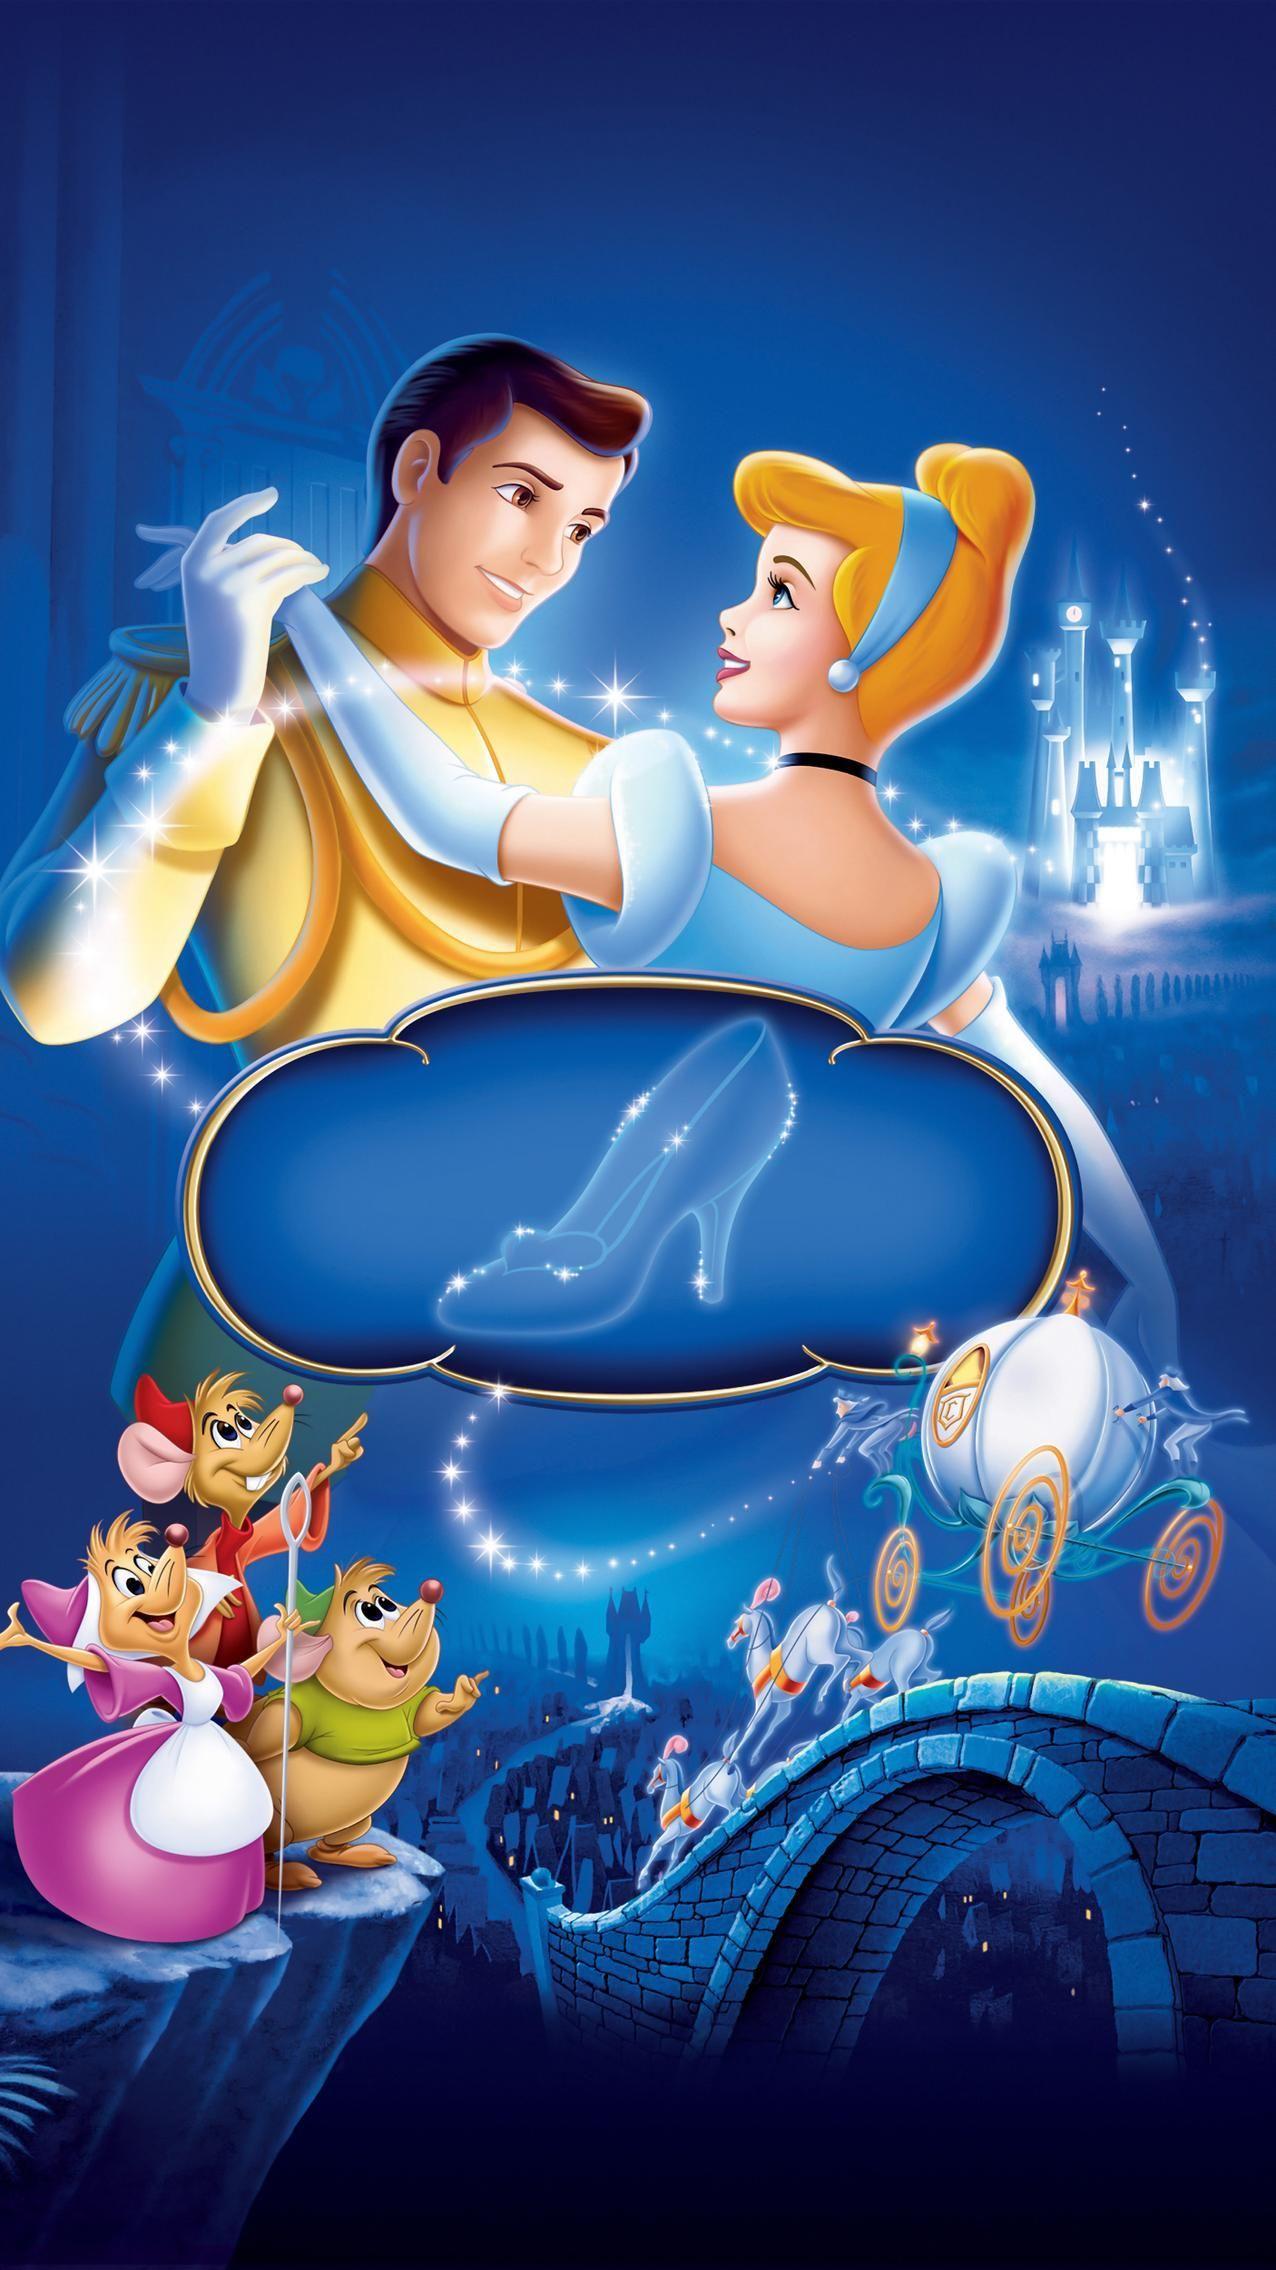 Disney Cinderella Phone Hd Wallpapers - Wallpaper Cave